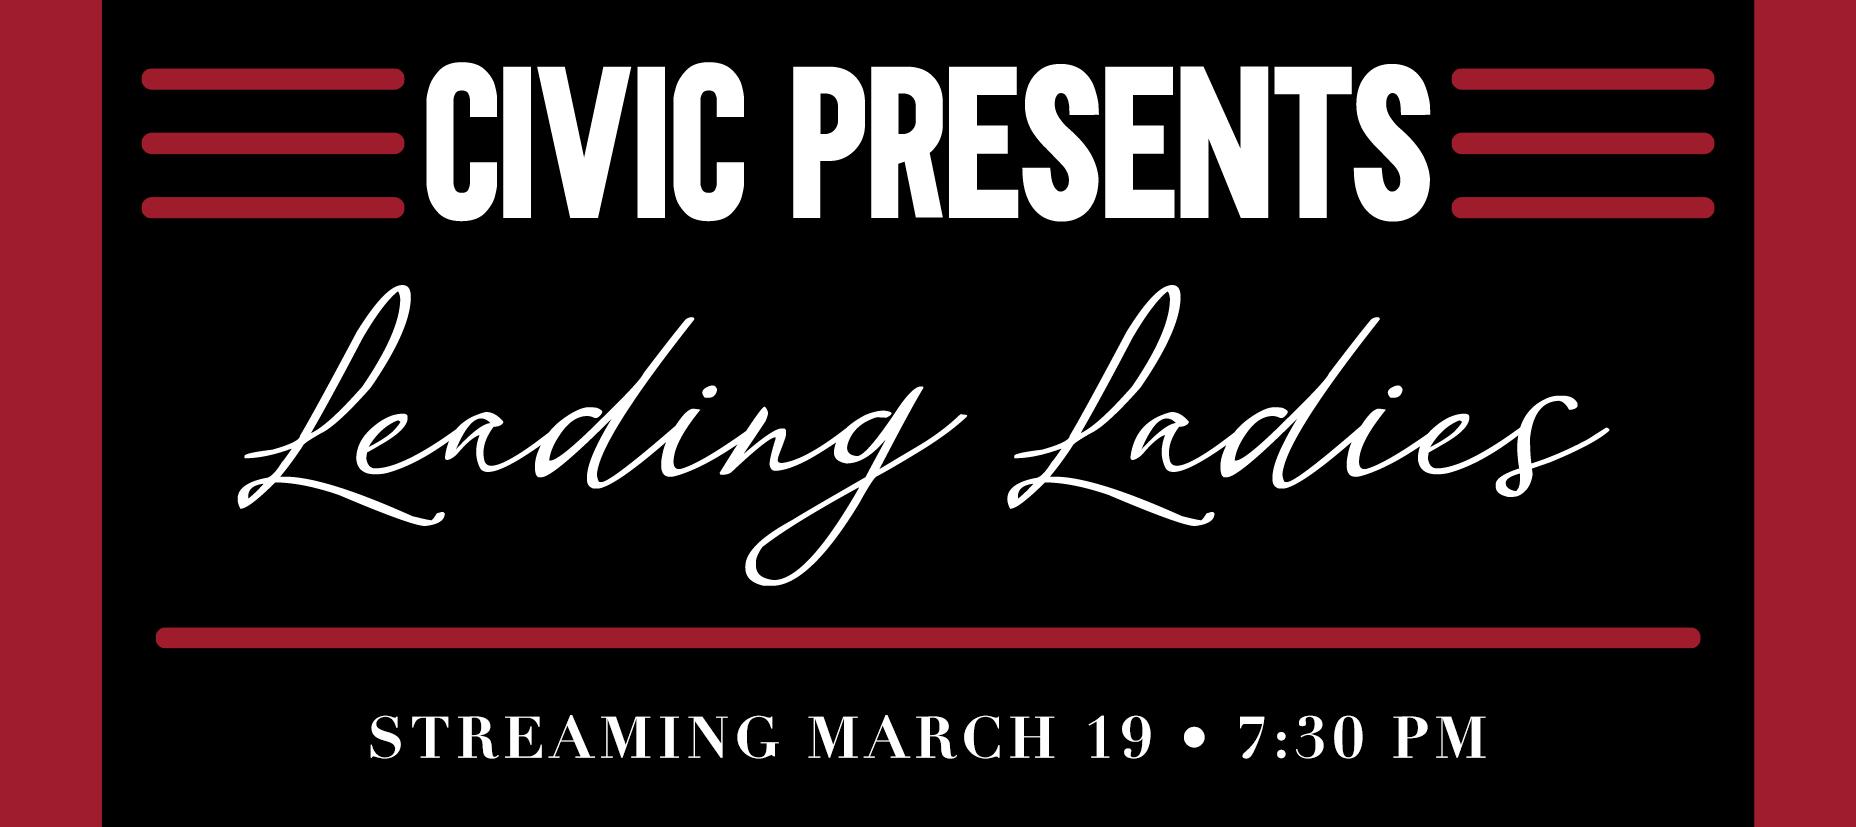 CIVIC PRESENTS Leading Ladies Tickets